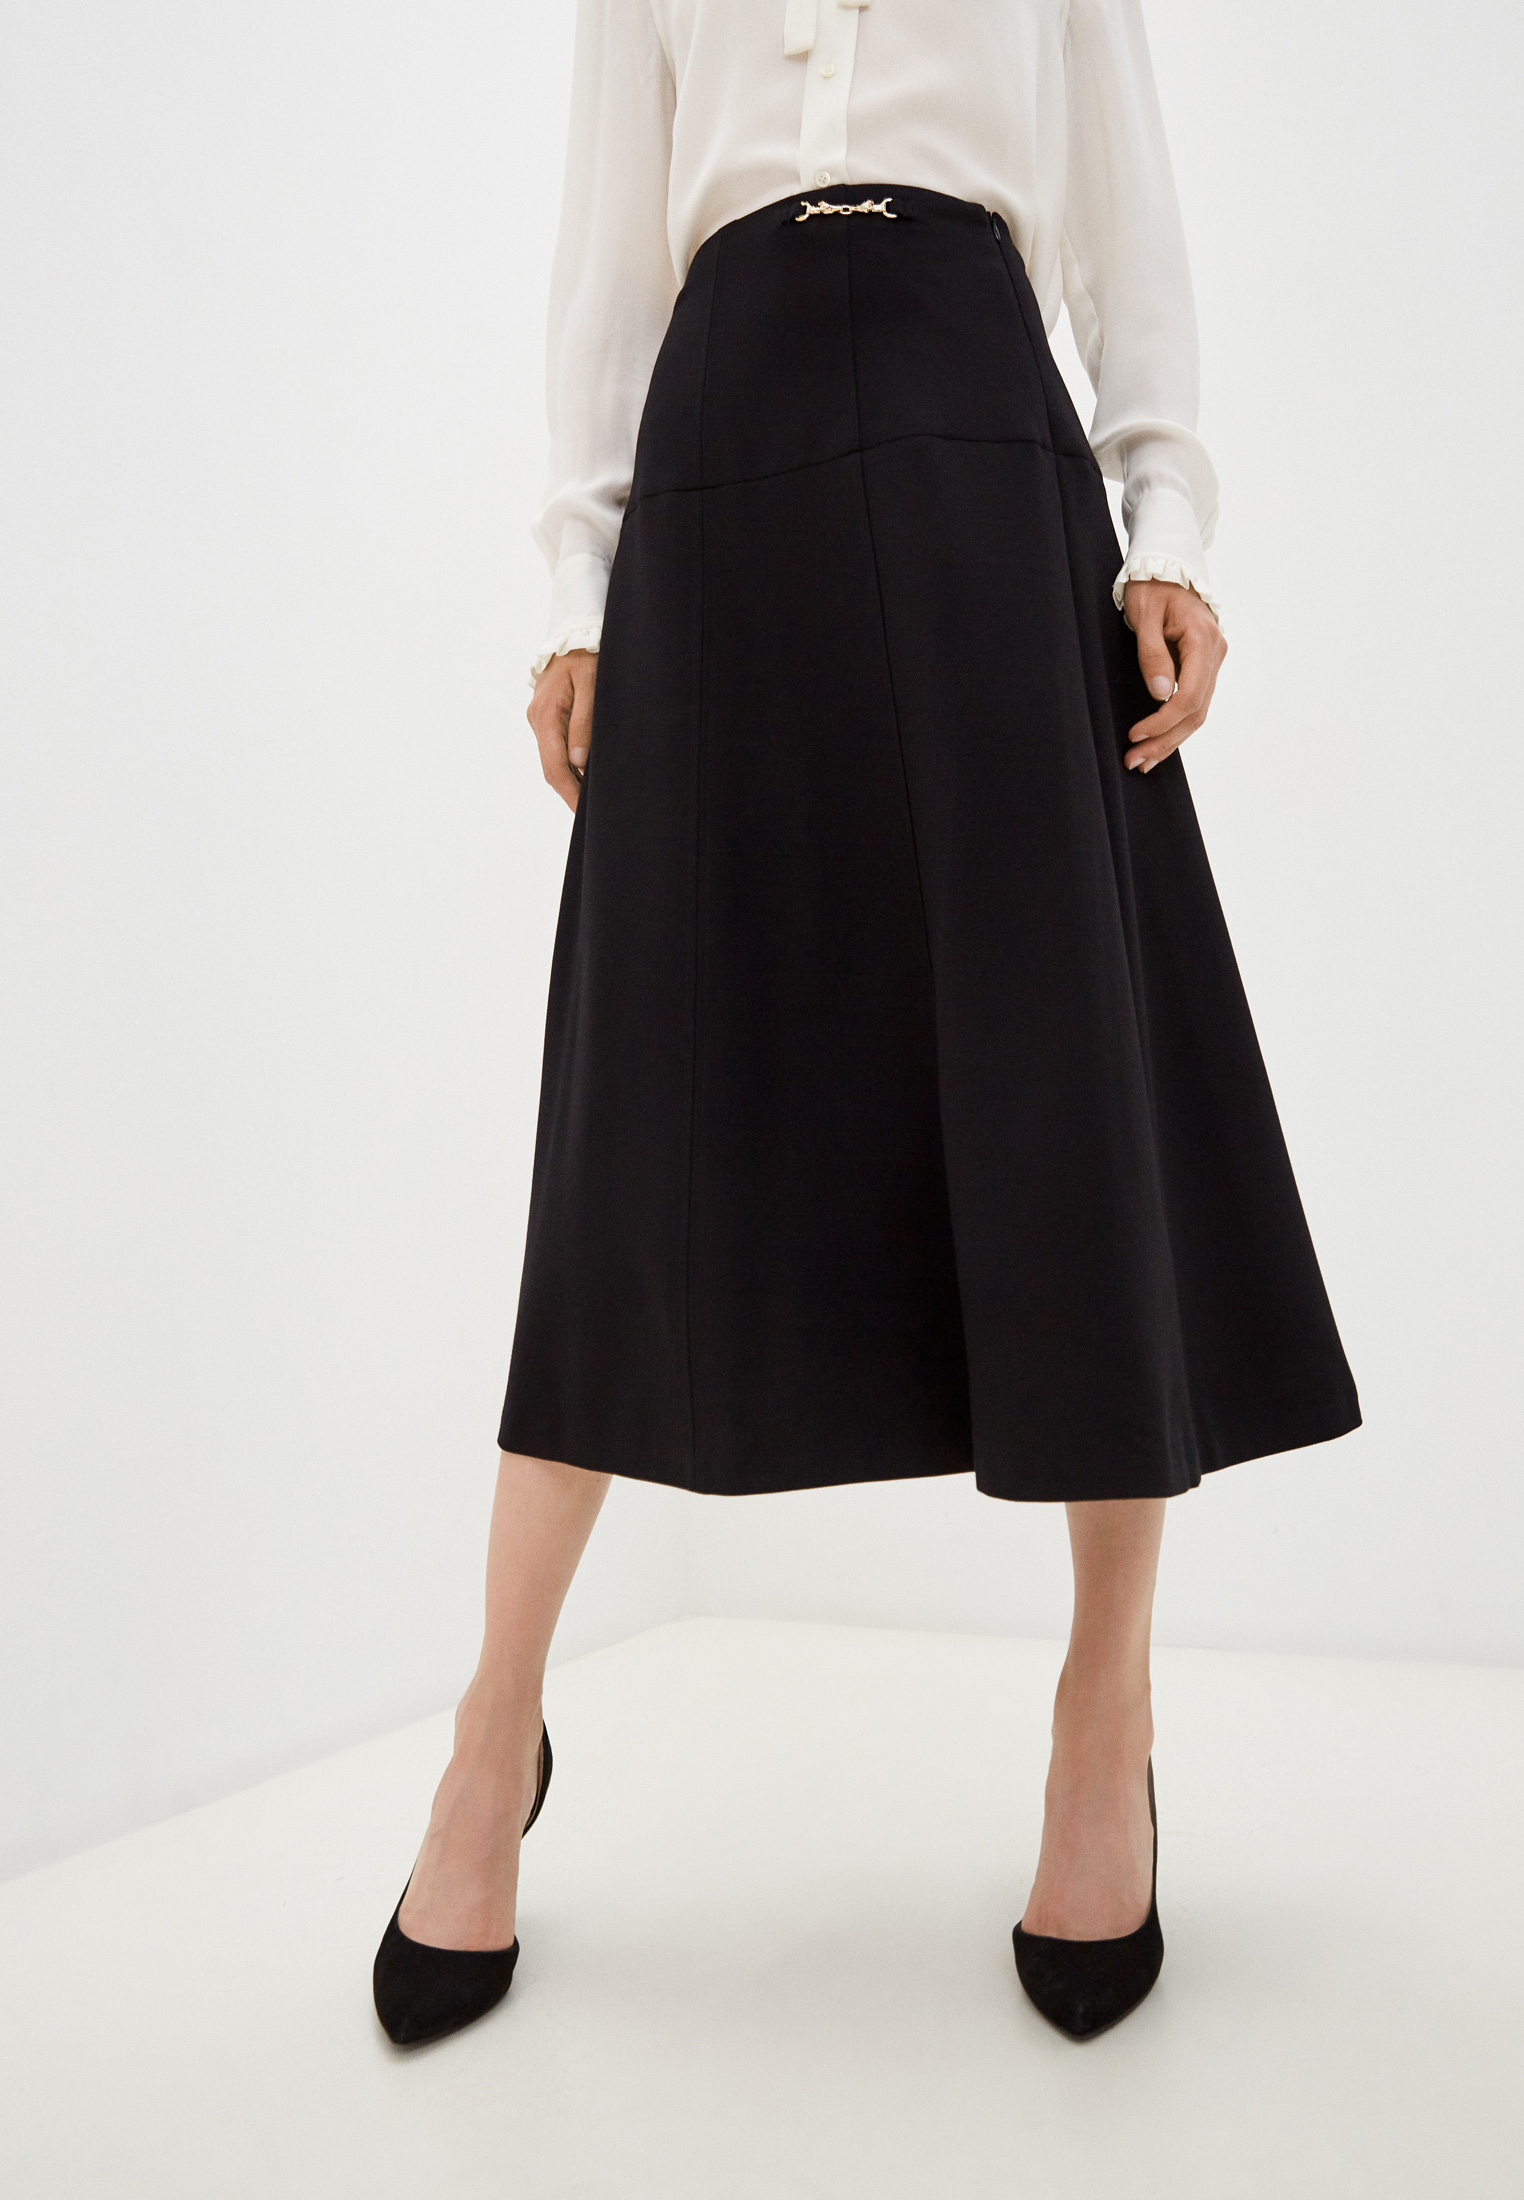 Широкая юбка Trussardi (Труссарди) Юбка Trussardi